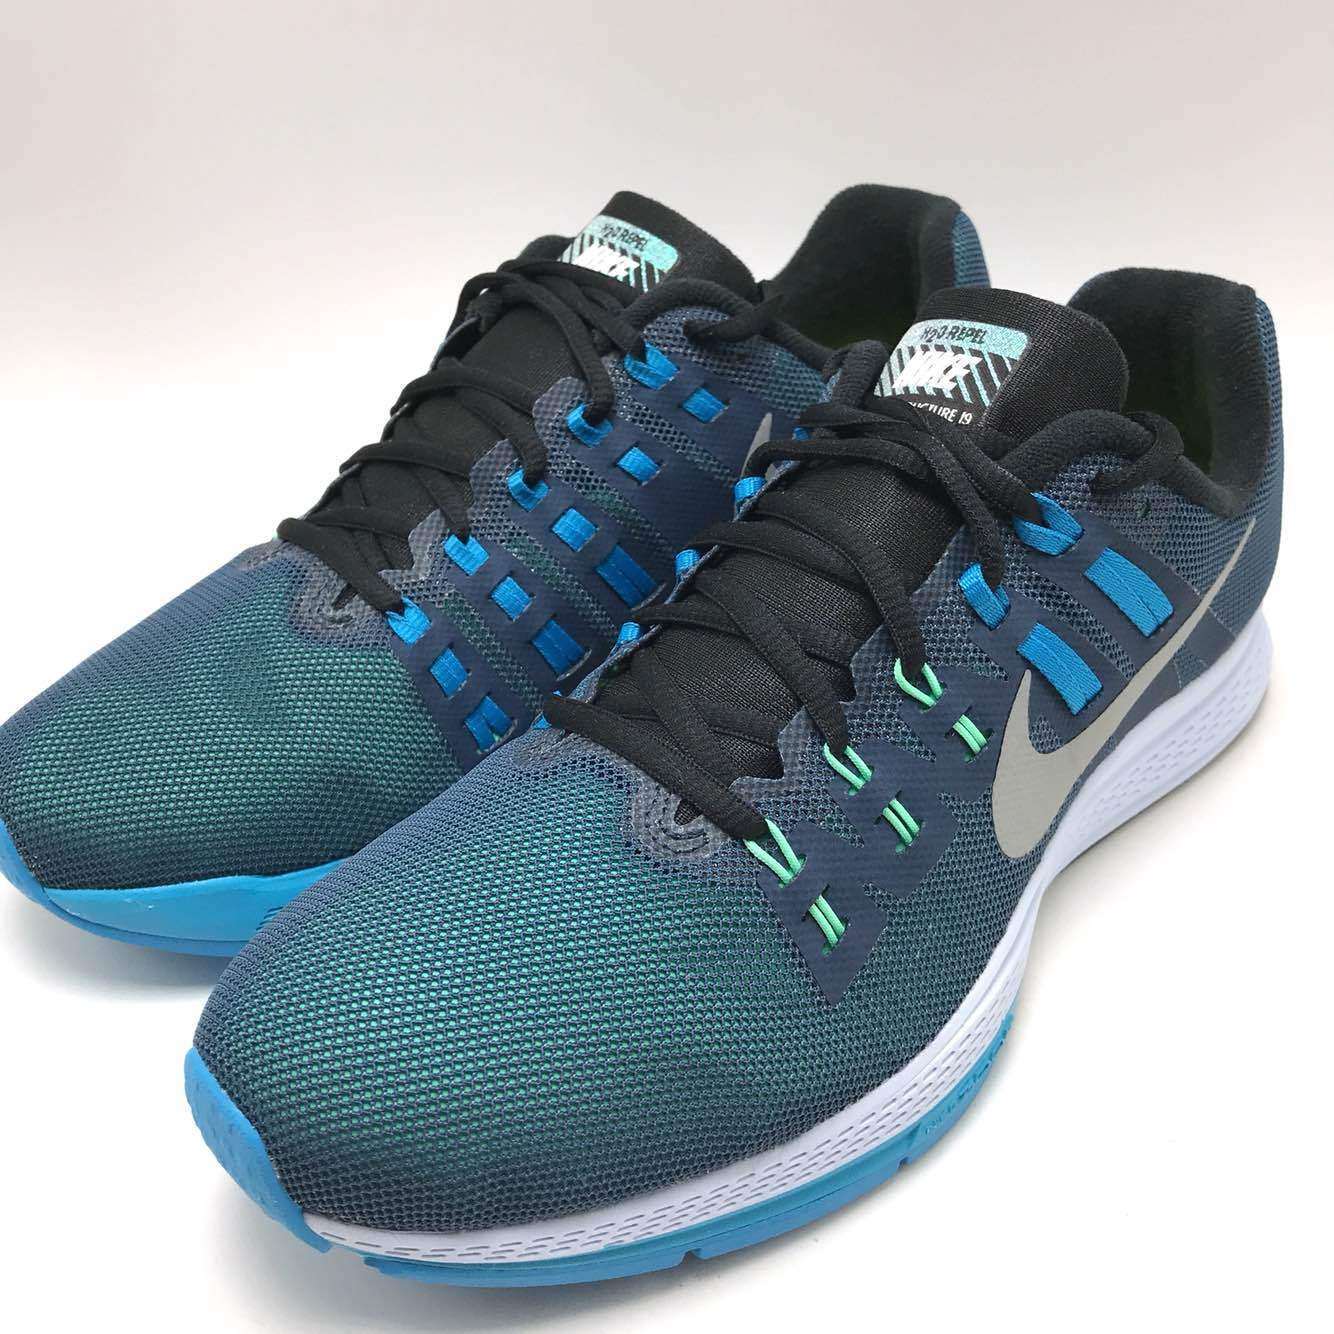 Nike Air Zoom Structure 19 Flash Men's Running SQDRN Blue/Silver-Blue 806578-400